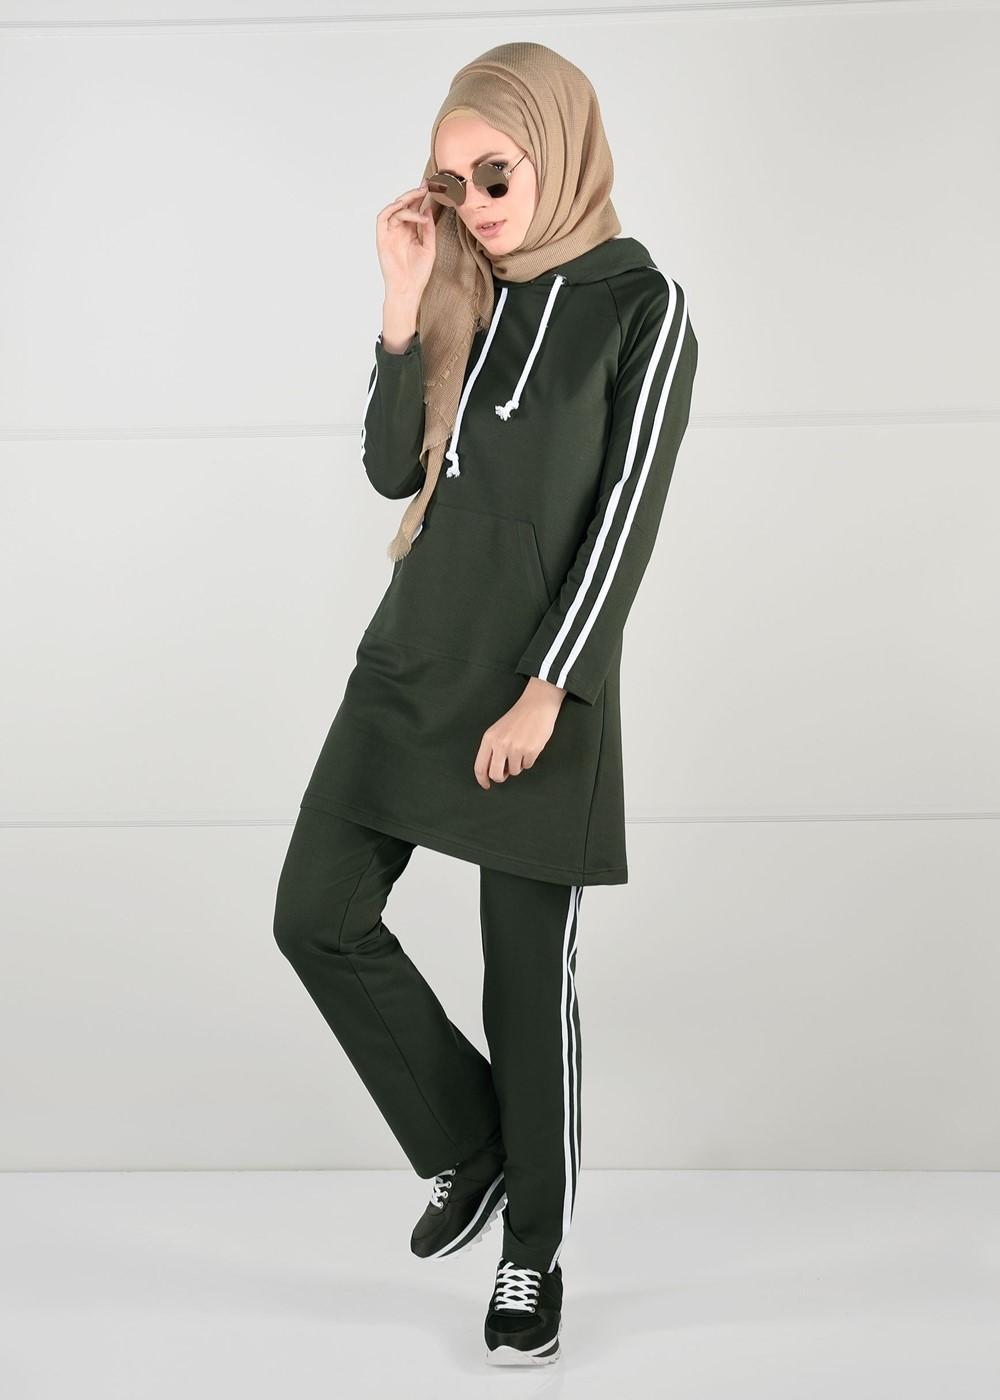 Femelle KAKI  Pantalon de Survêtement T 1500